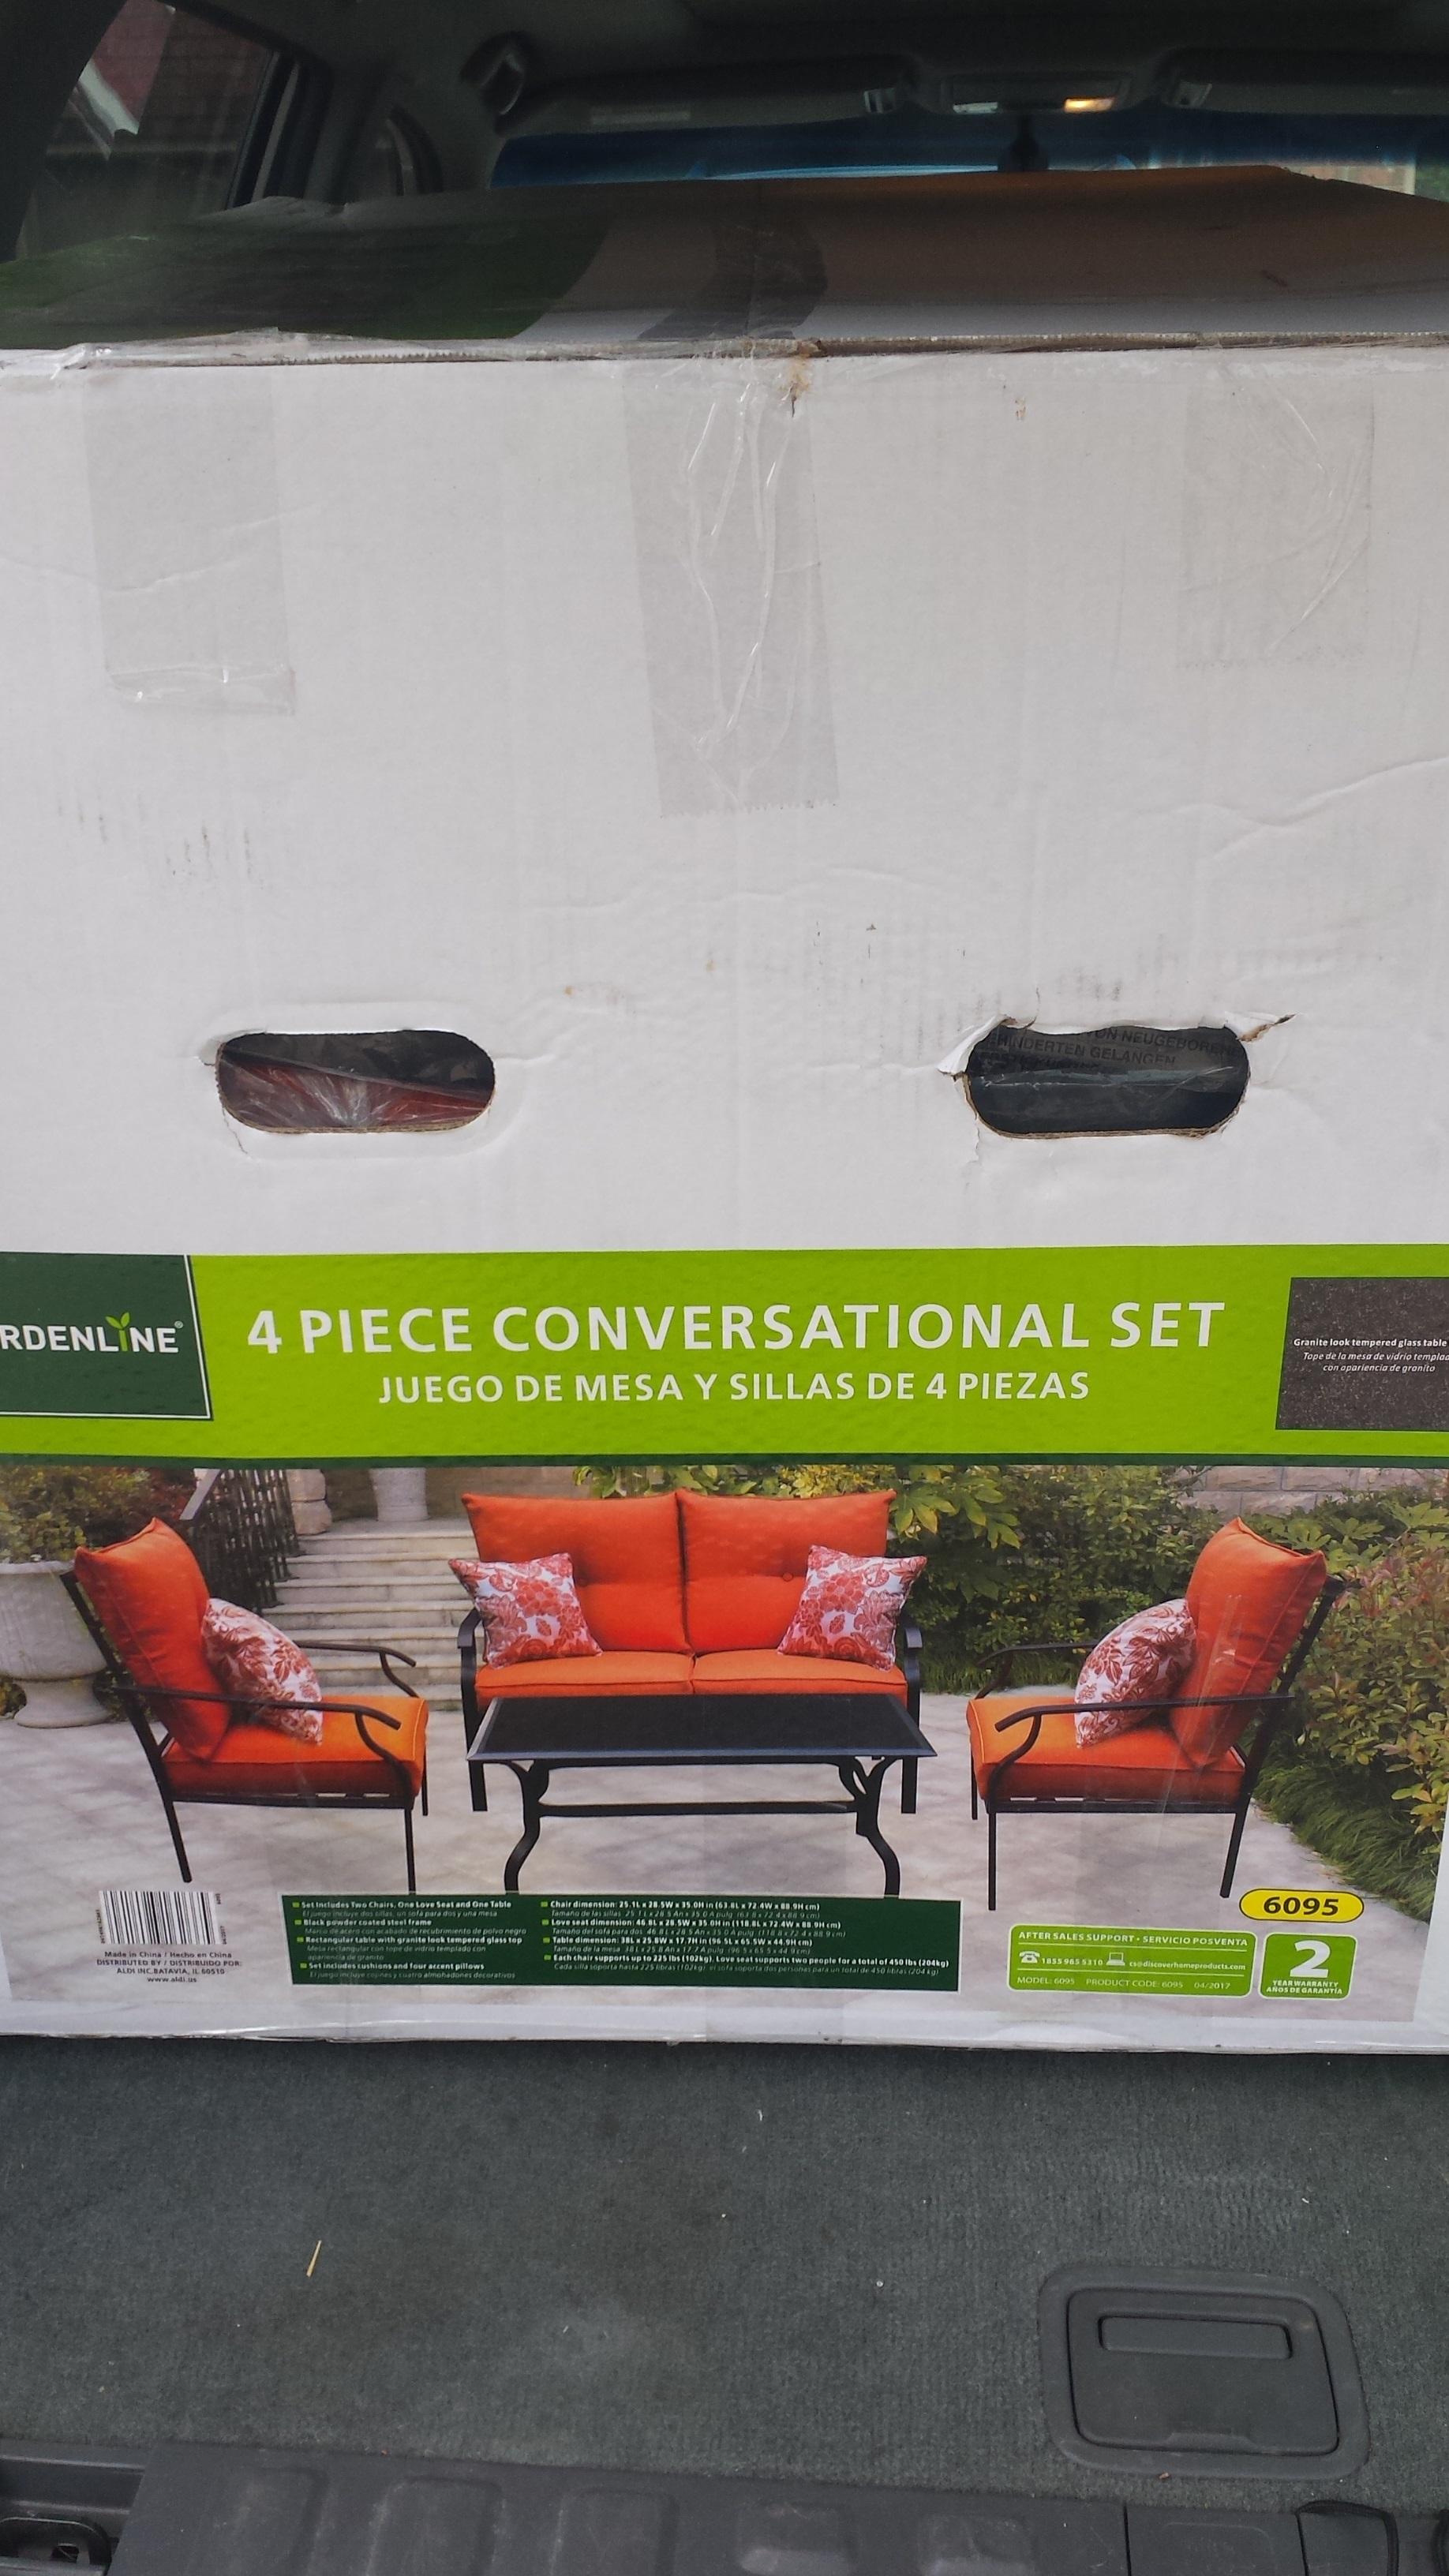 Aldi B&M 4-piece Outdoor Conversational Set - $99.99 - YMMV